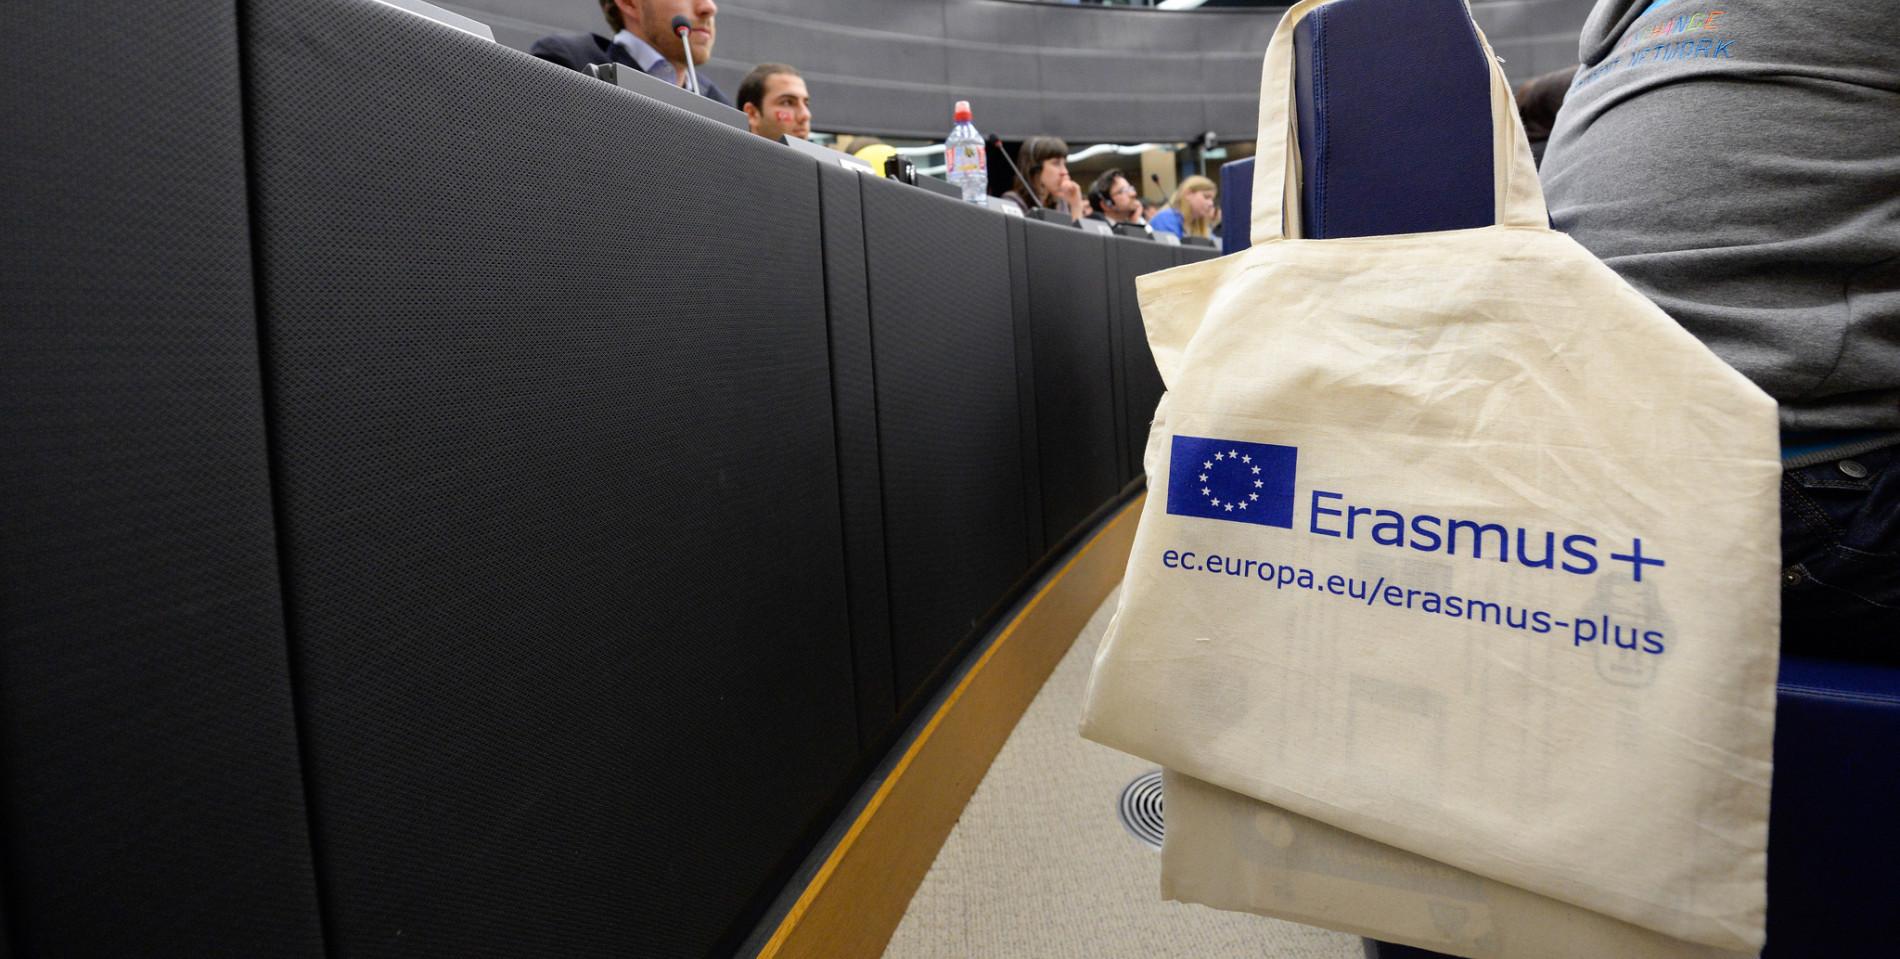 Erasmus+ bags